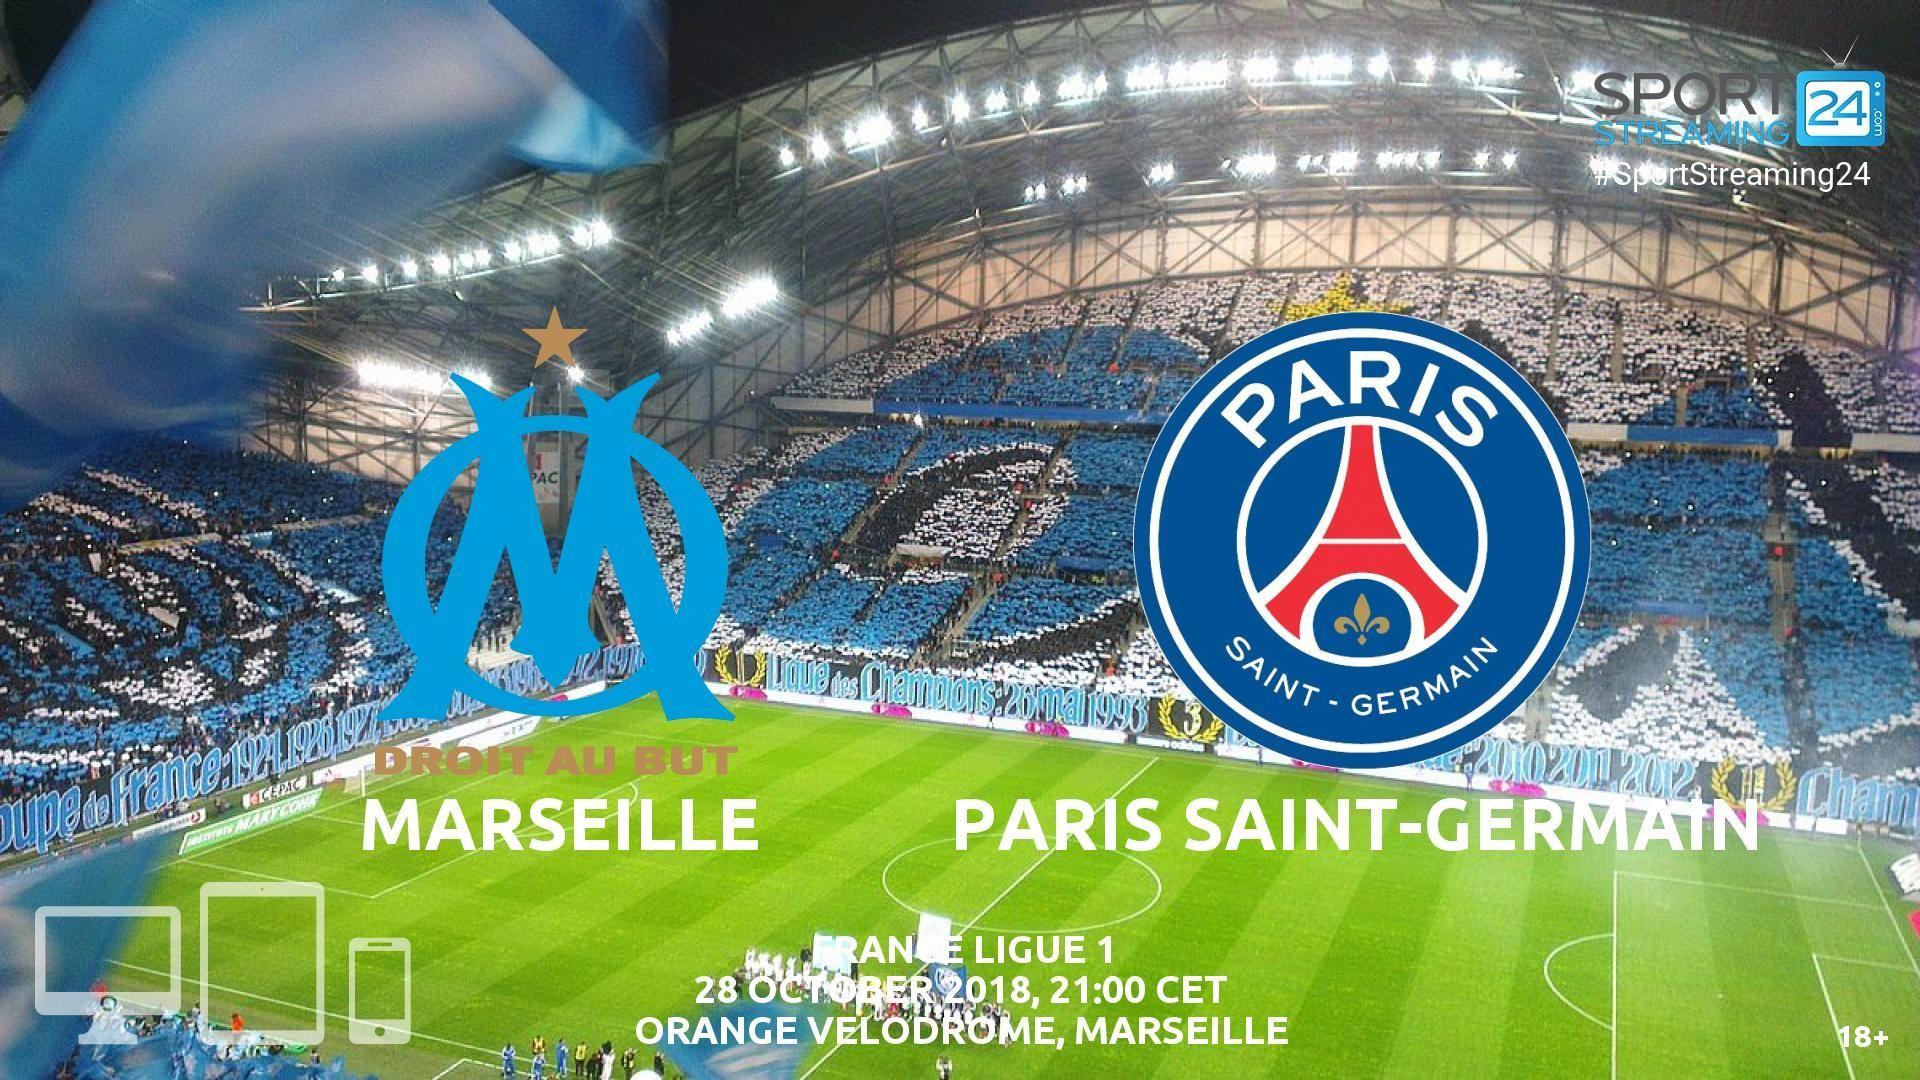 Marseille v PSG Live Streaming Football Marseille, Psg